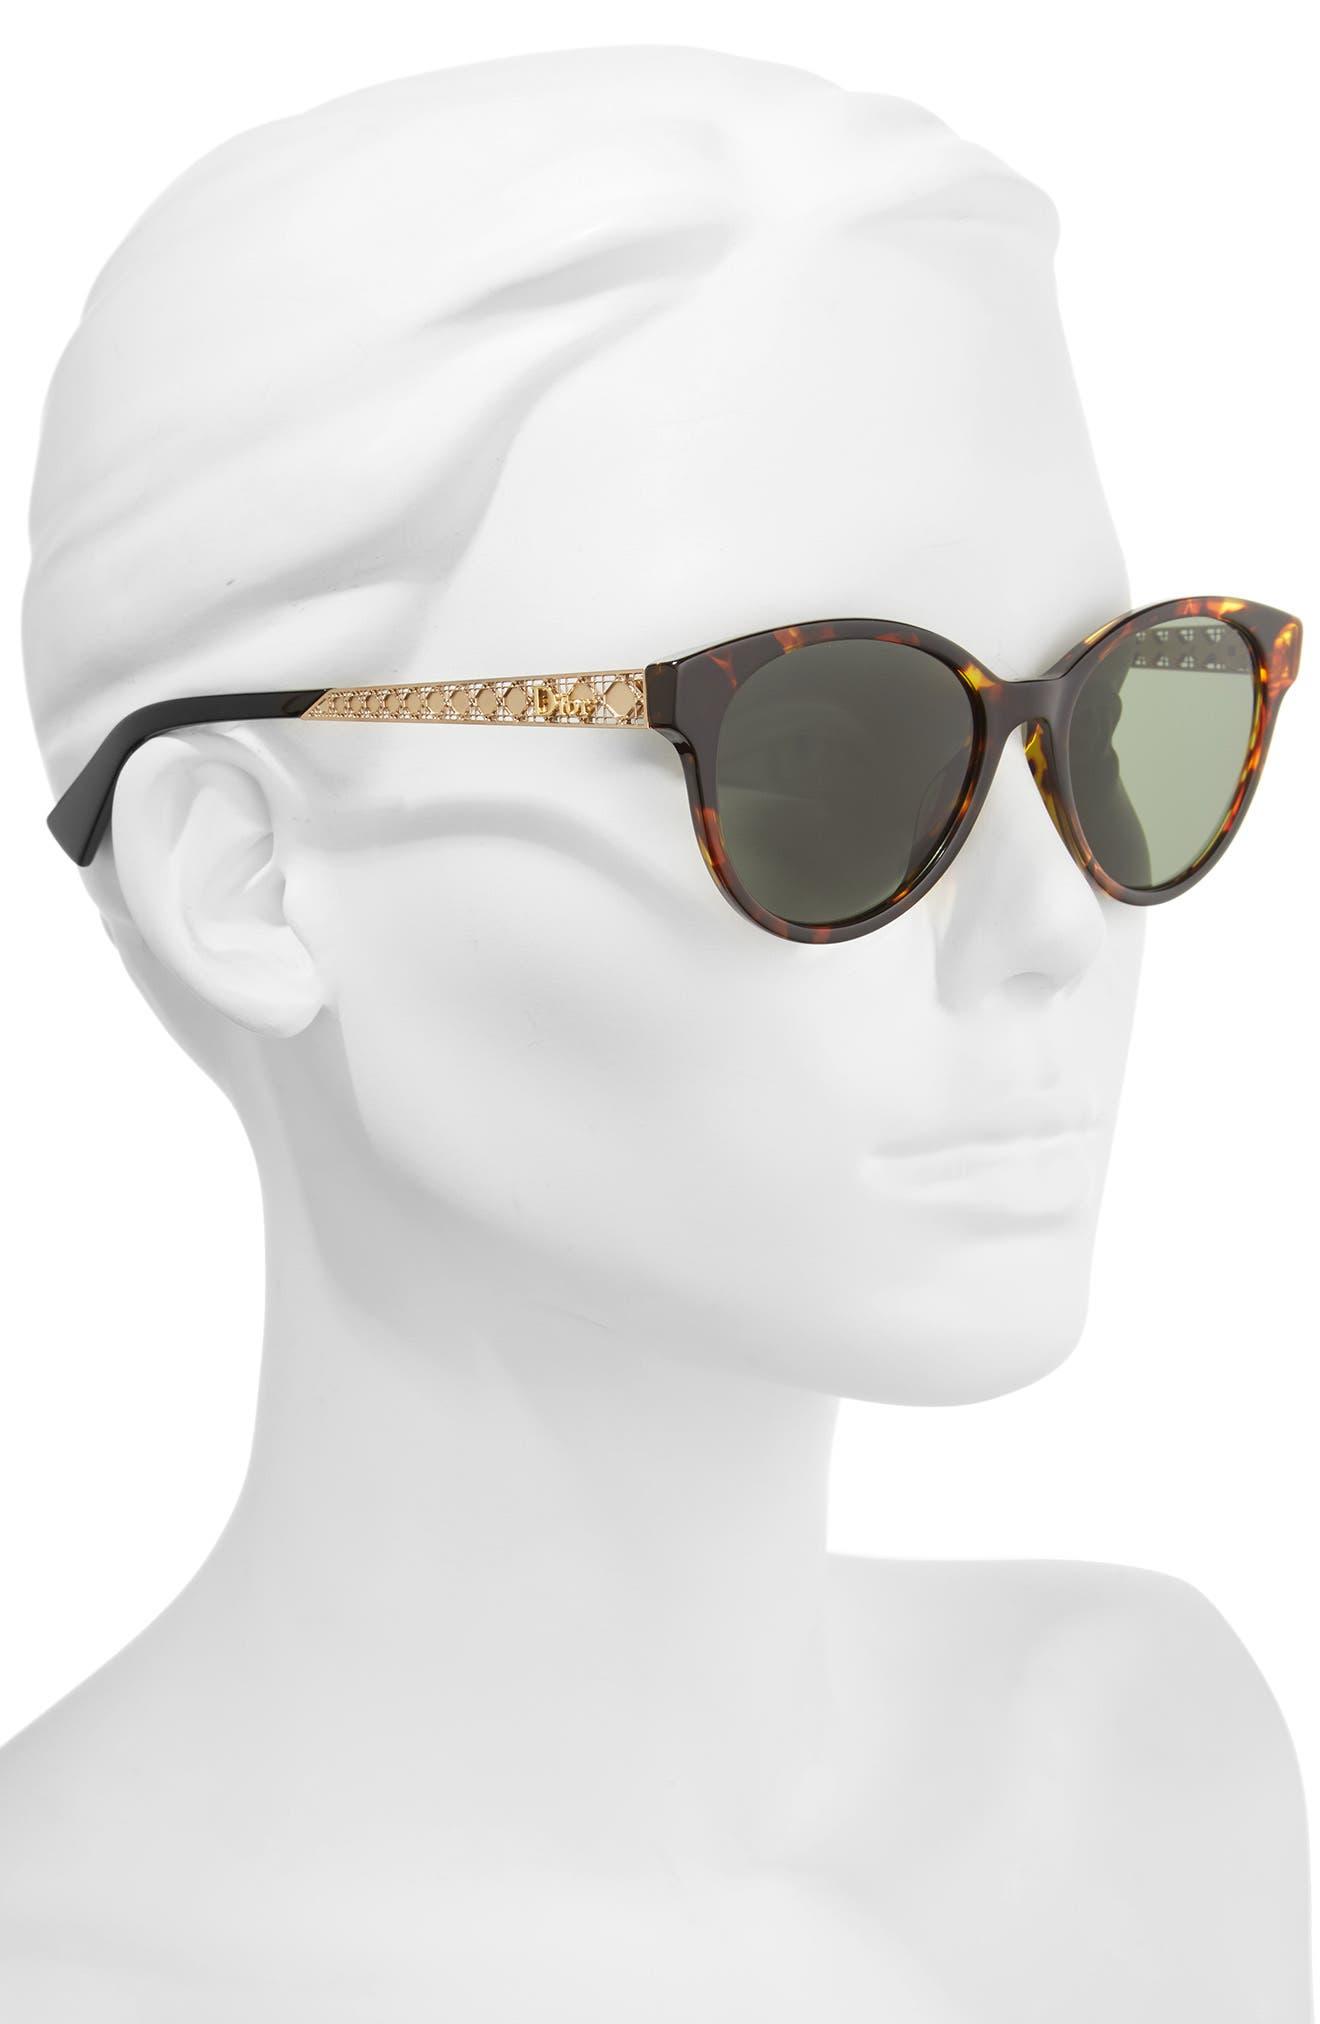 Diorama Mini 52mm Mirrored Lens Special Fit Sunglasses,                             Alternate thumbnail 2, color,                             Havana/ Gold